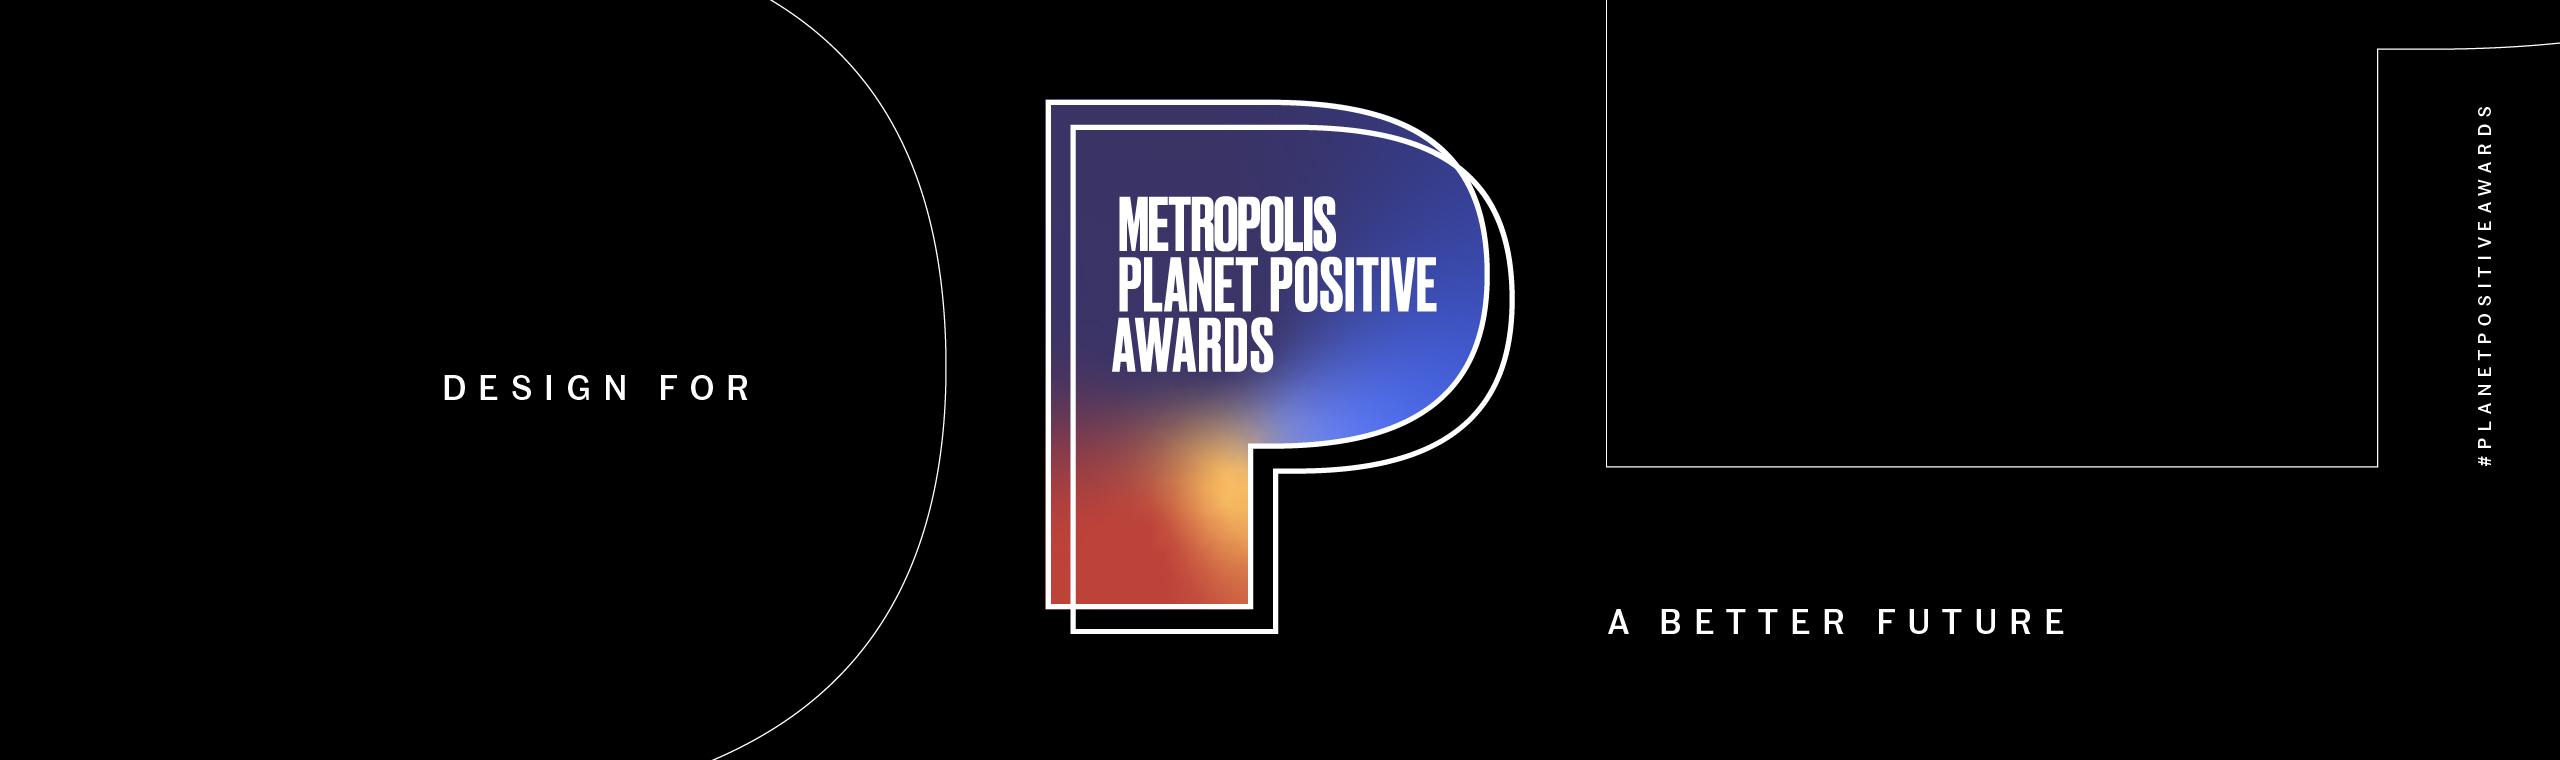 Metropolis Planet Positive Awards